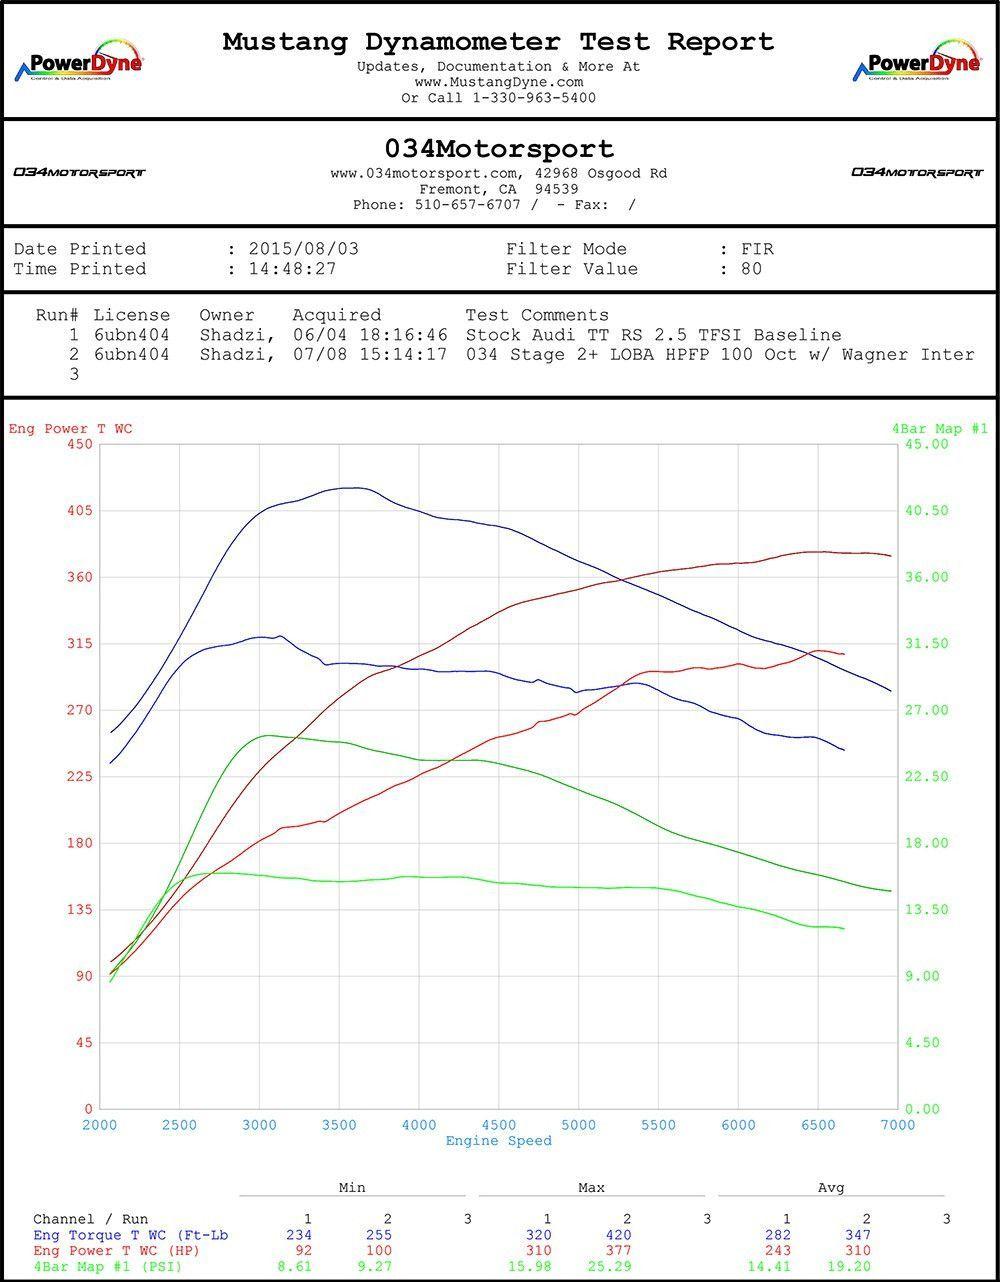 medium resolution of 034motorsport audi ttrs 2 5 tfsi stage 2 hpfp ecu upgrade performance software audi turbo brakes turbokit bsh ledlights coilpacks apr ctsturbo